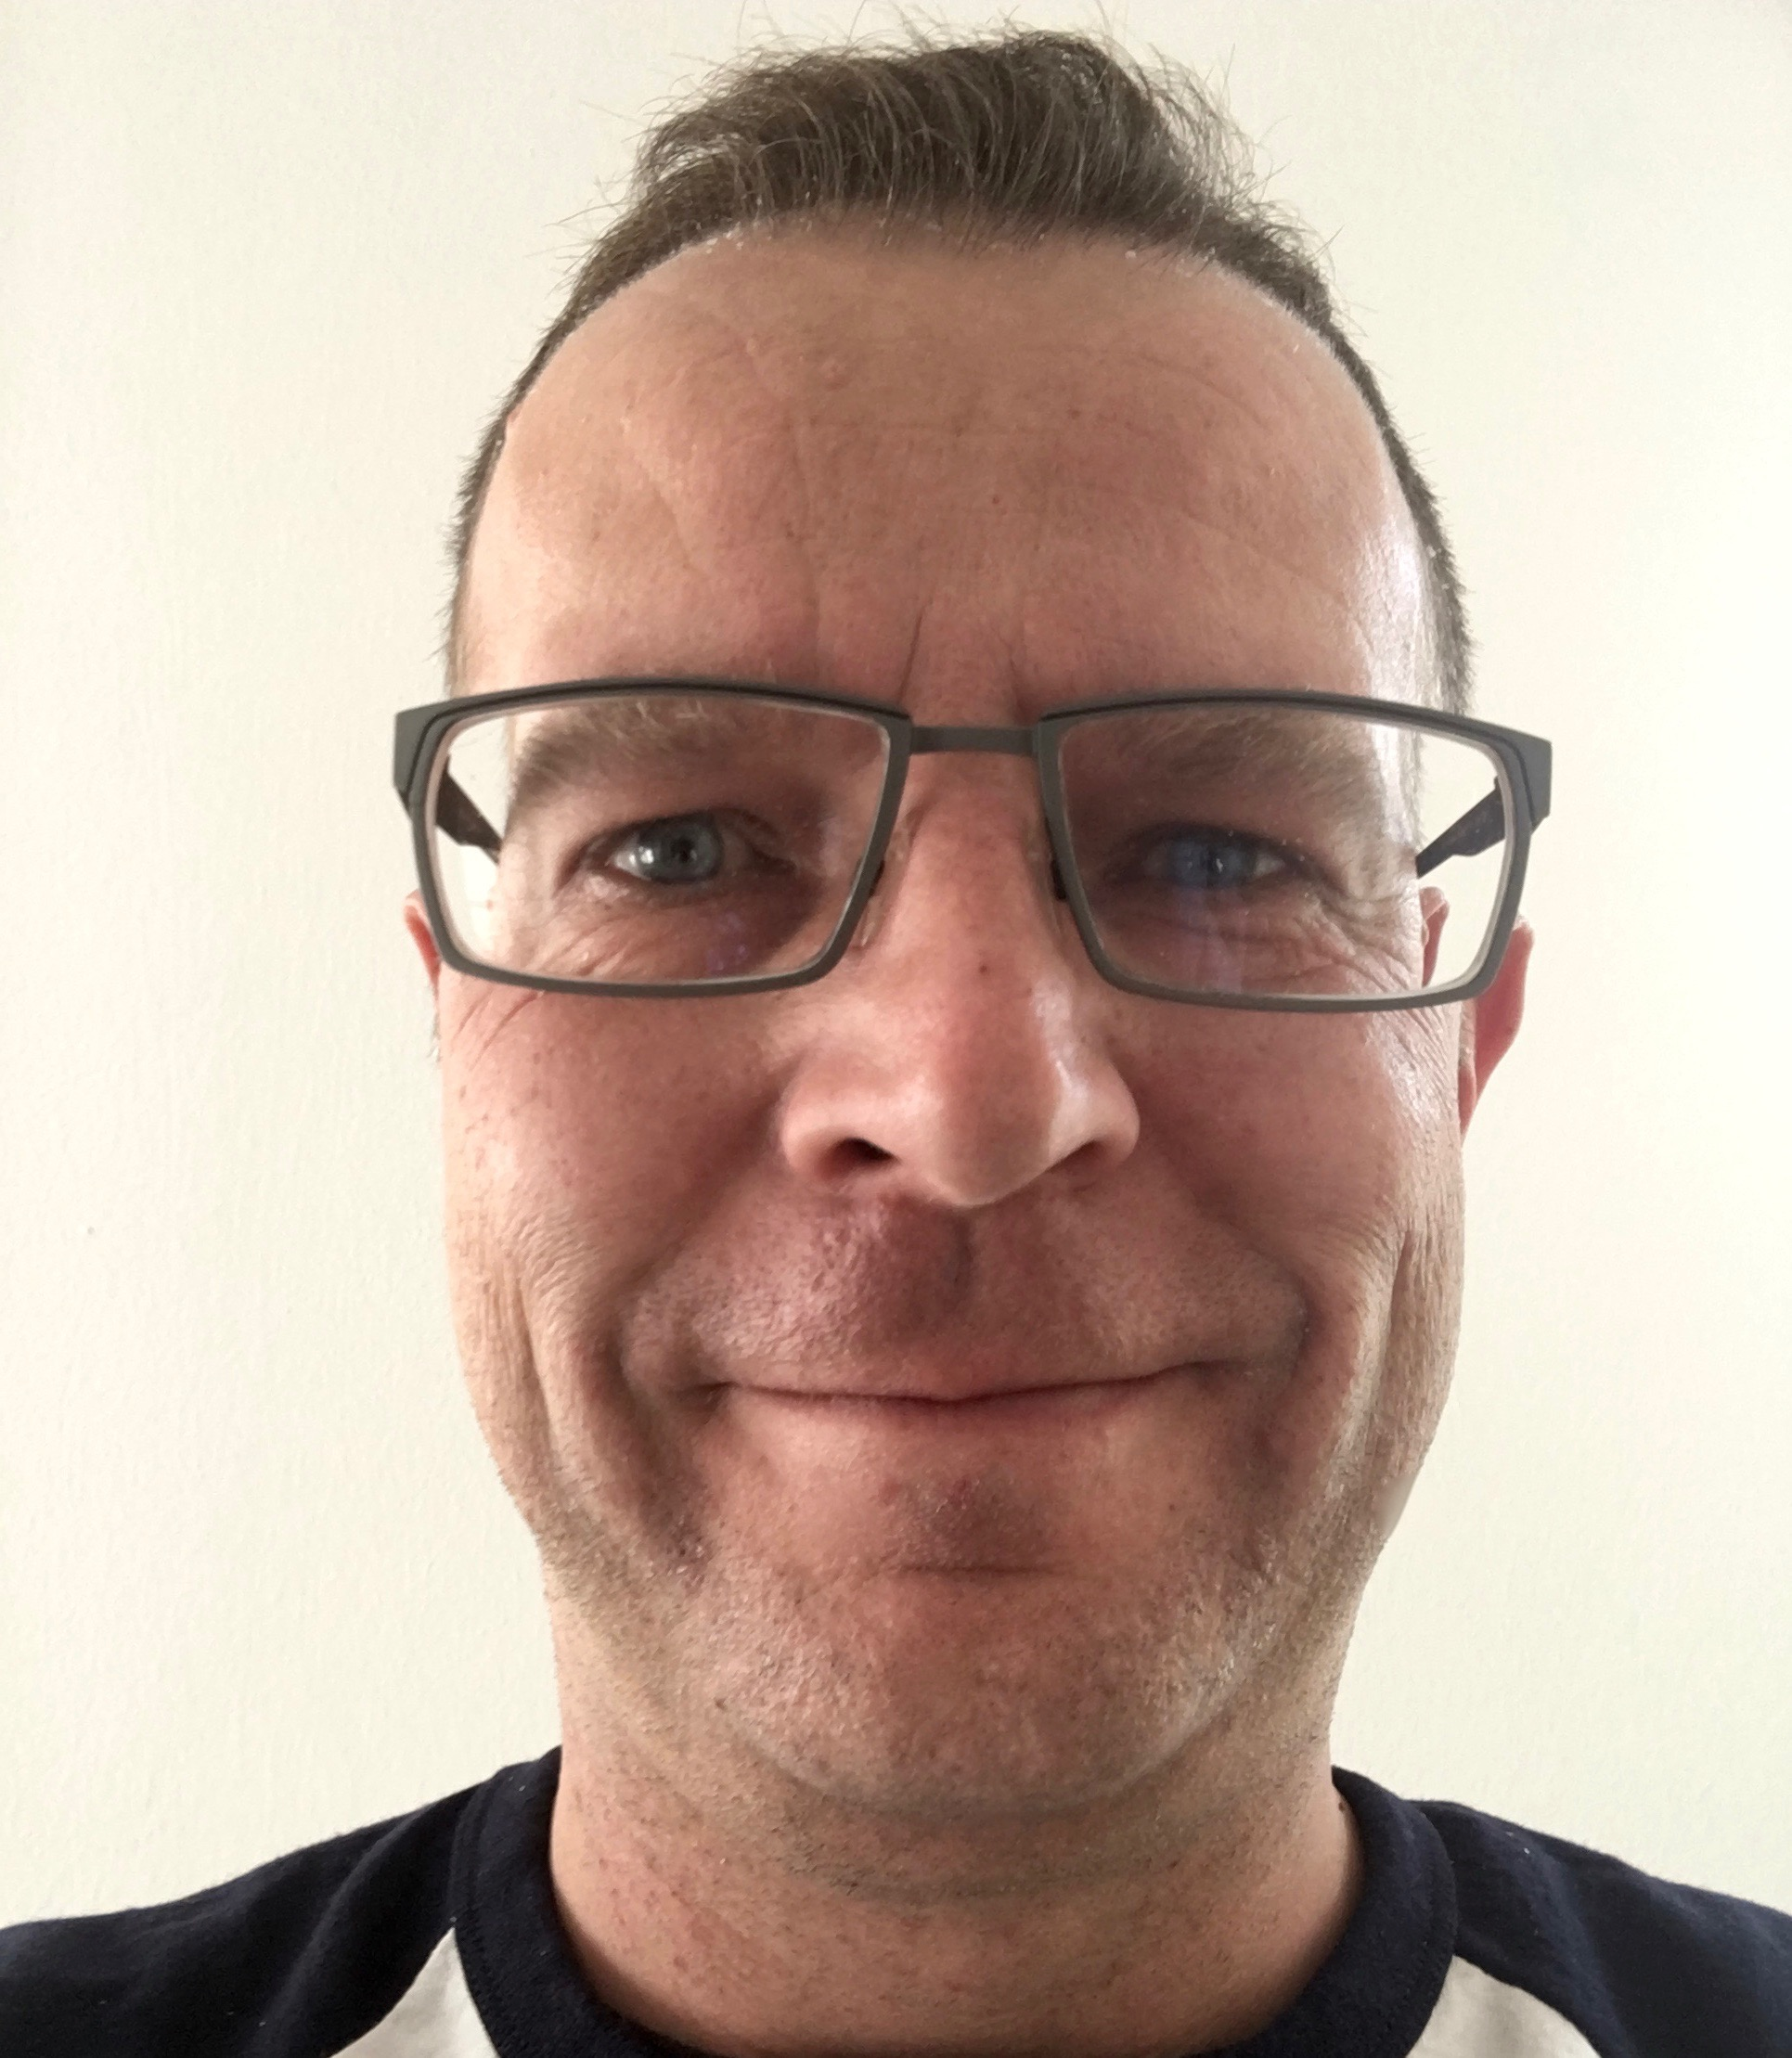 Security Lead Peter Prochaska